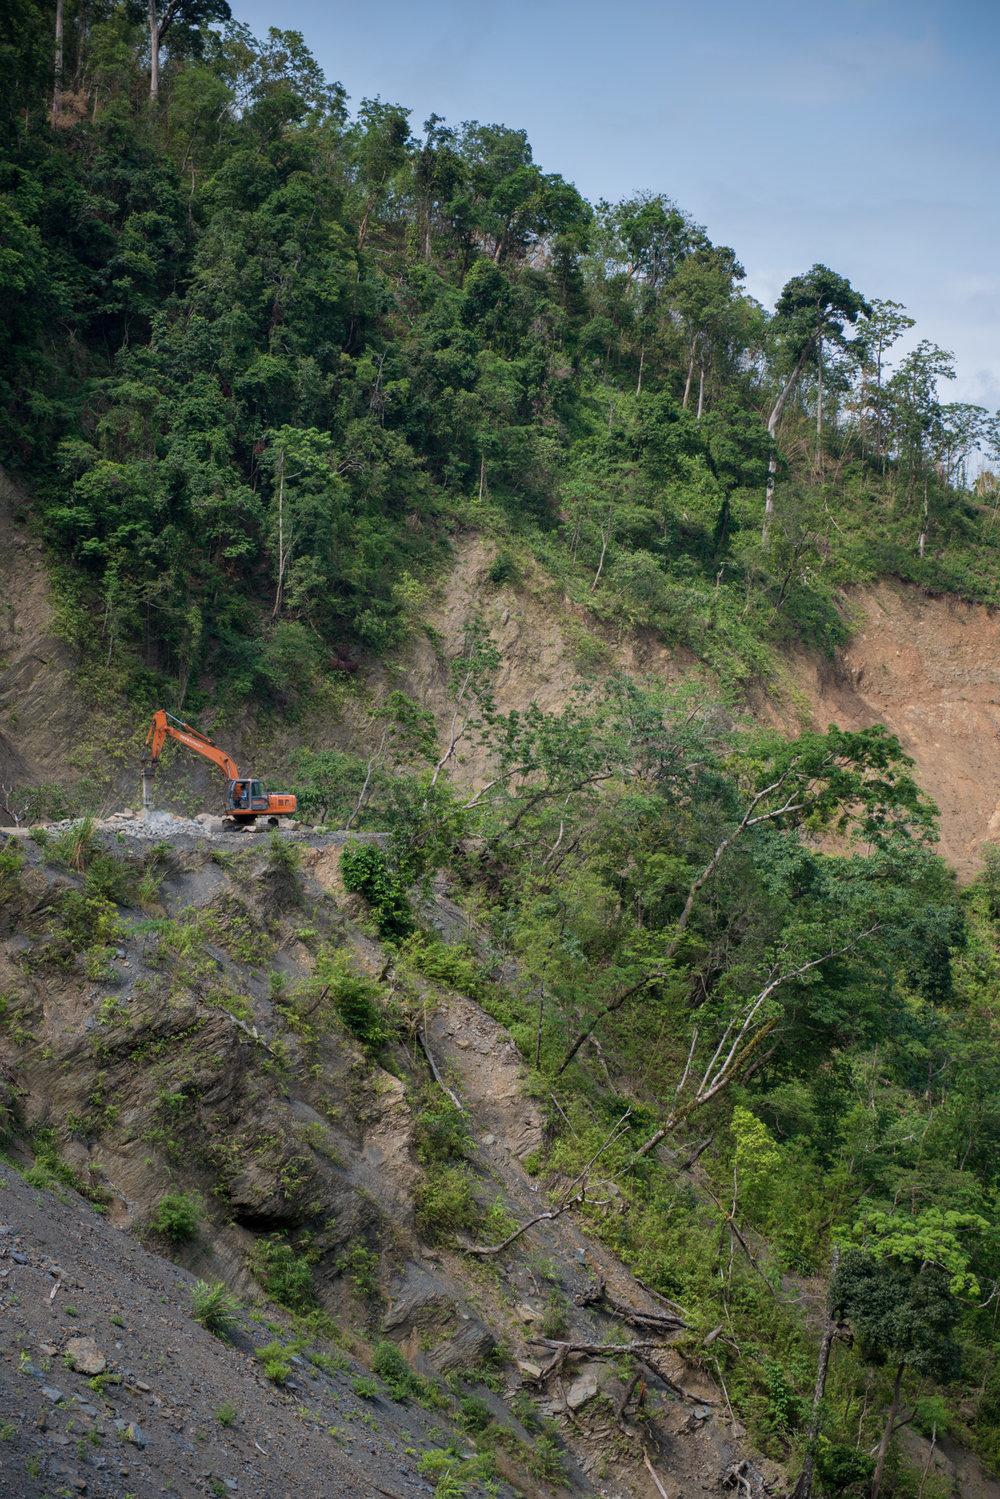 4_Chhandak Pradhan-Reportage-The_Promise_of_Asphalt-Border_road_NE India_Burma_Le Monde.jpg